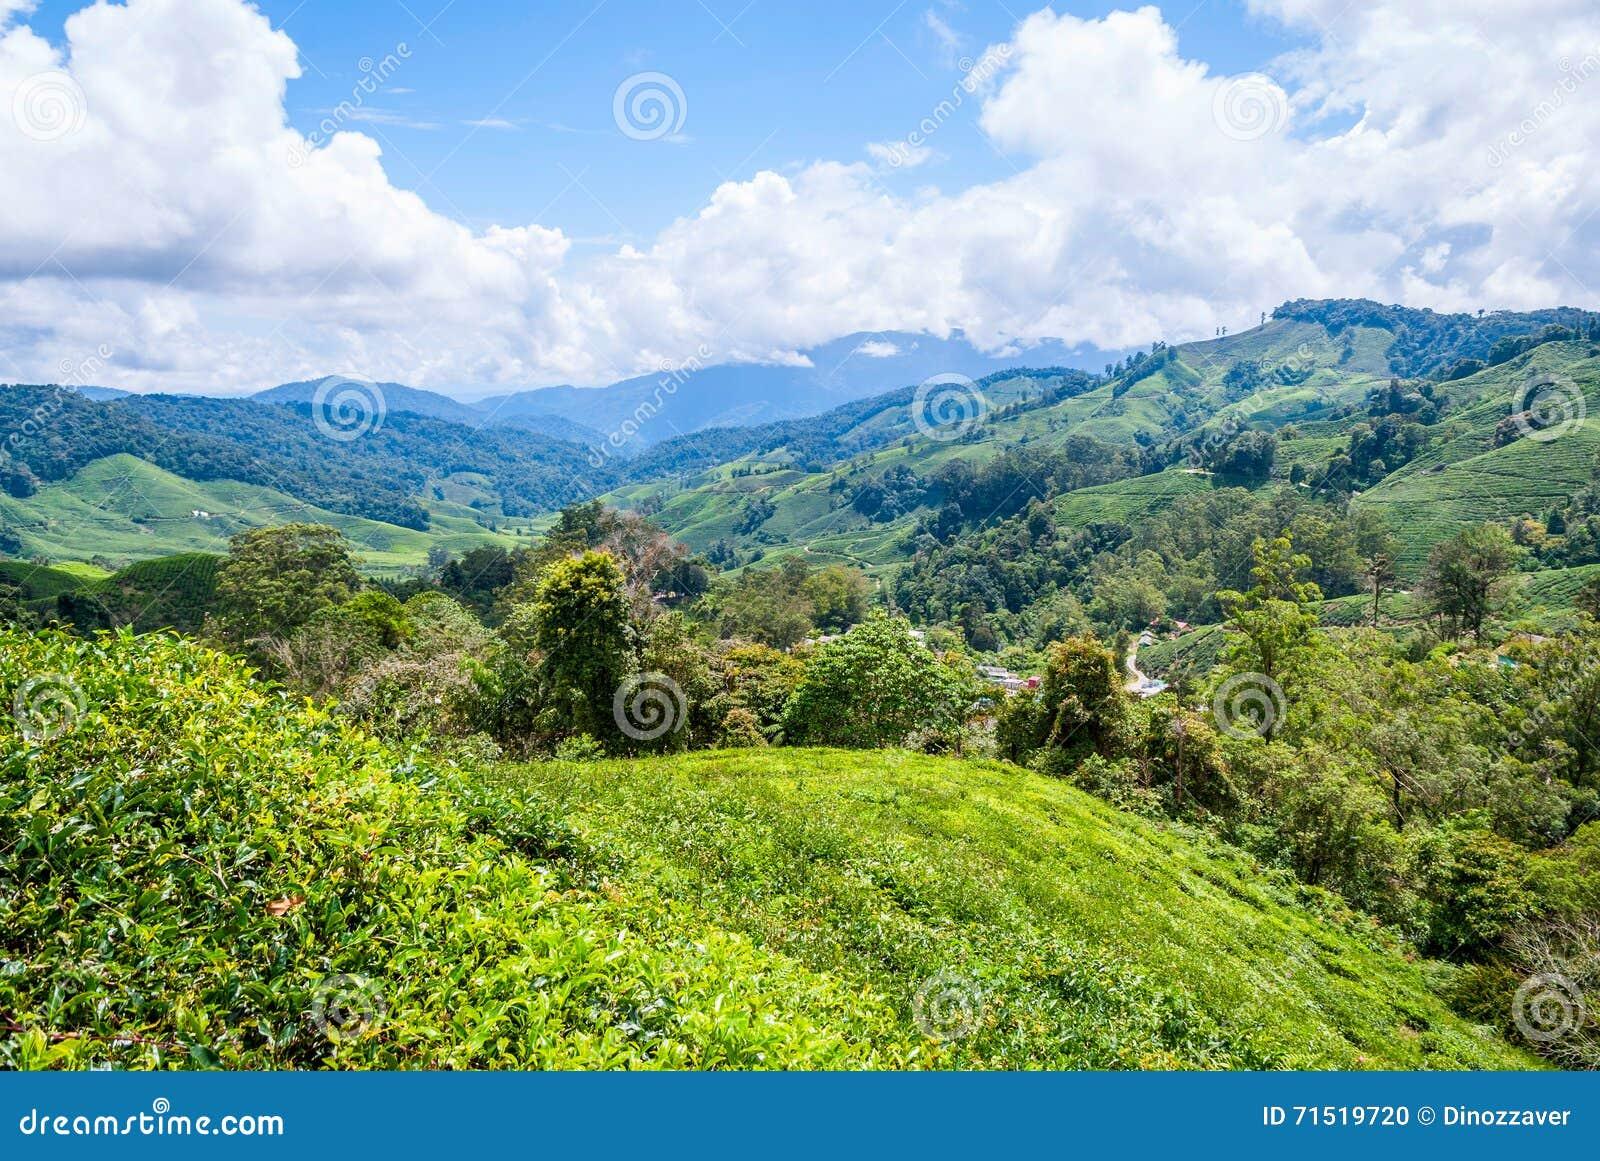 Tea Plantation In Cameron Highlands, Malaysia Stock Photo ...